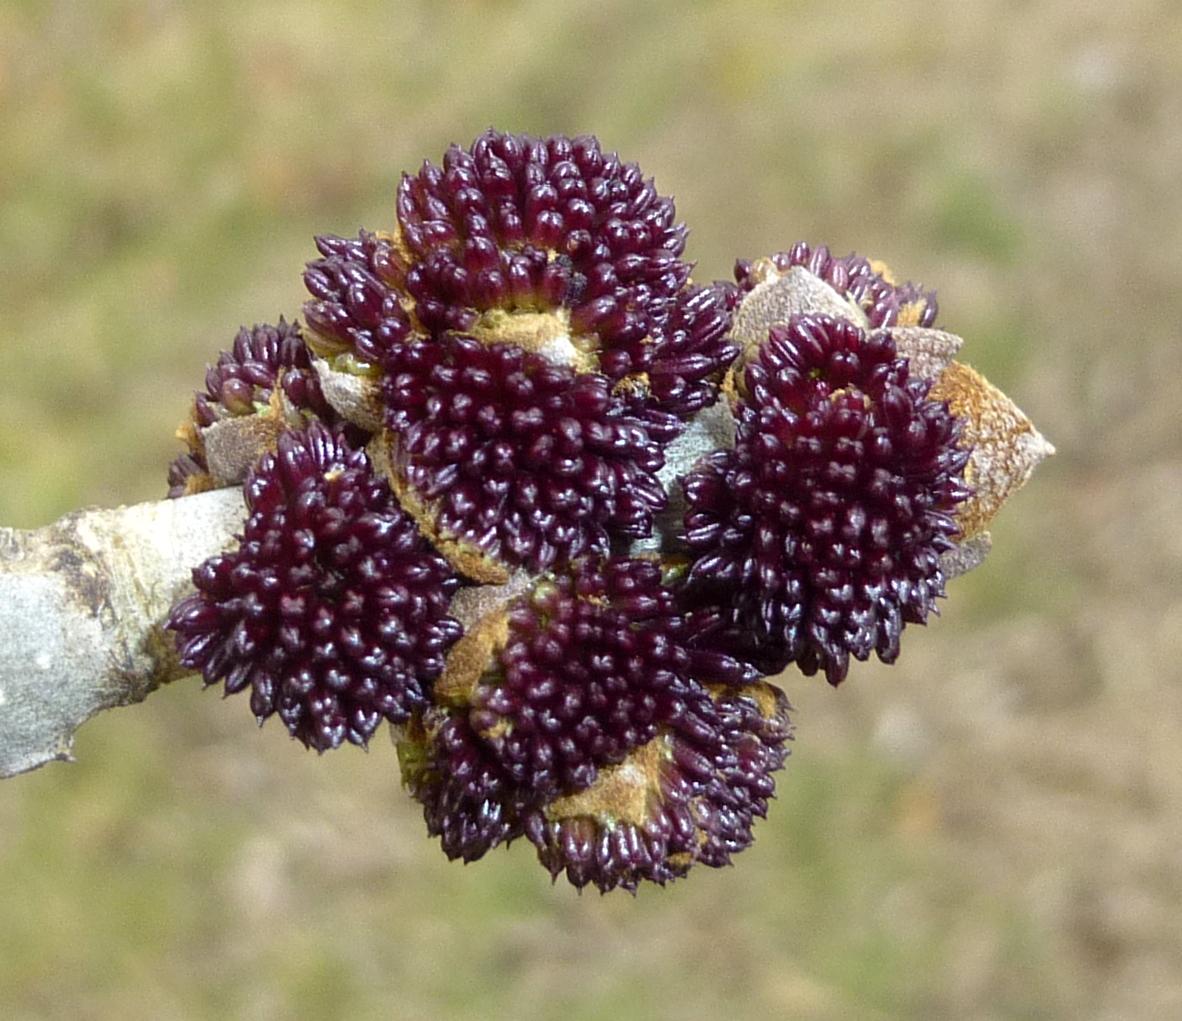 14. White Ash Buds aka Fraxinus americana